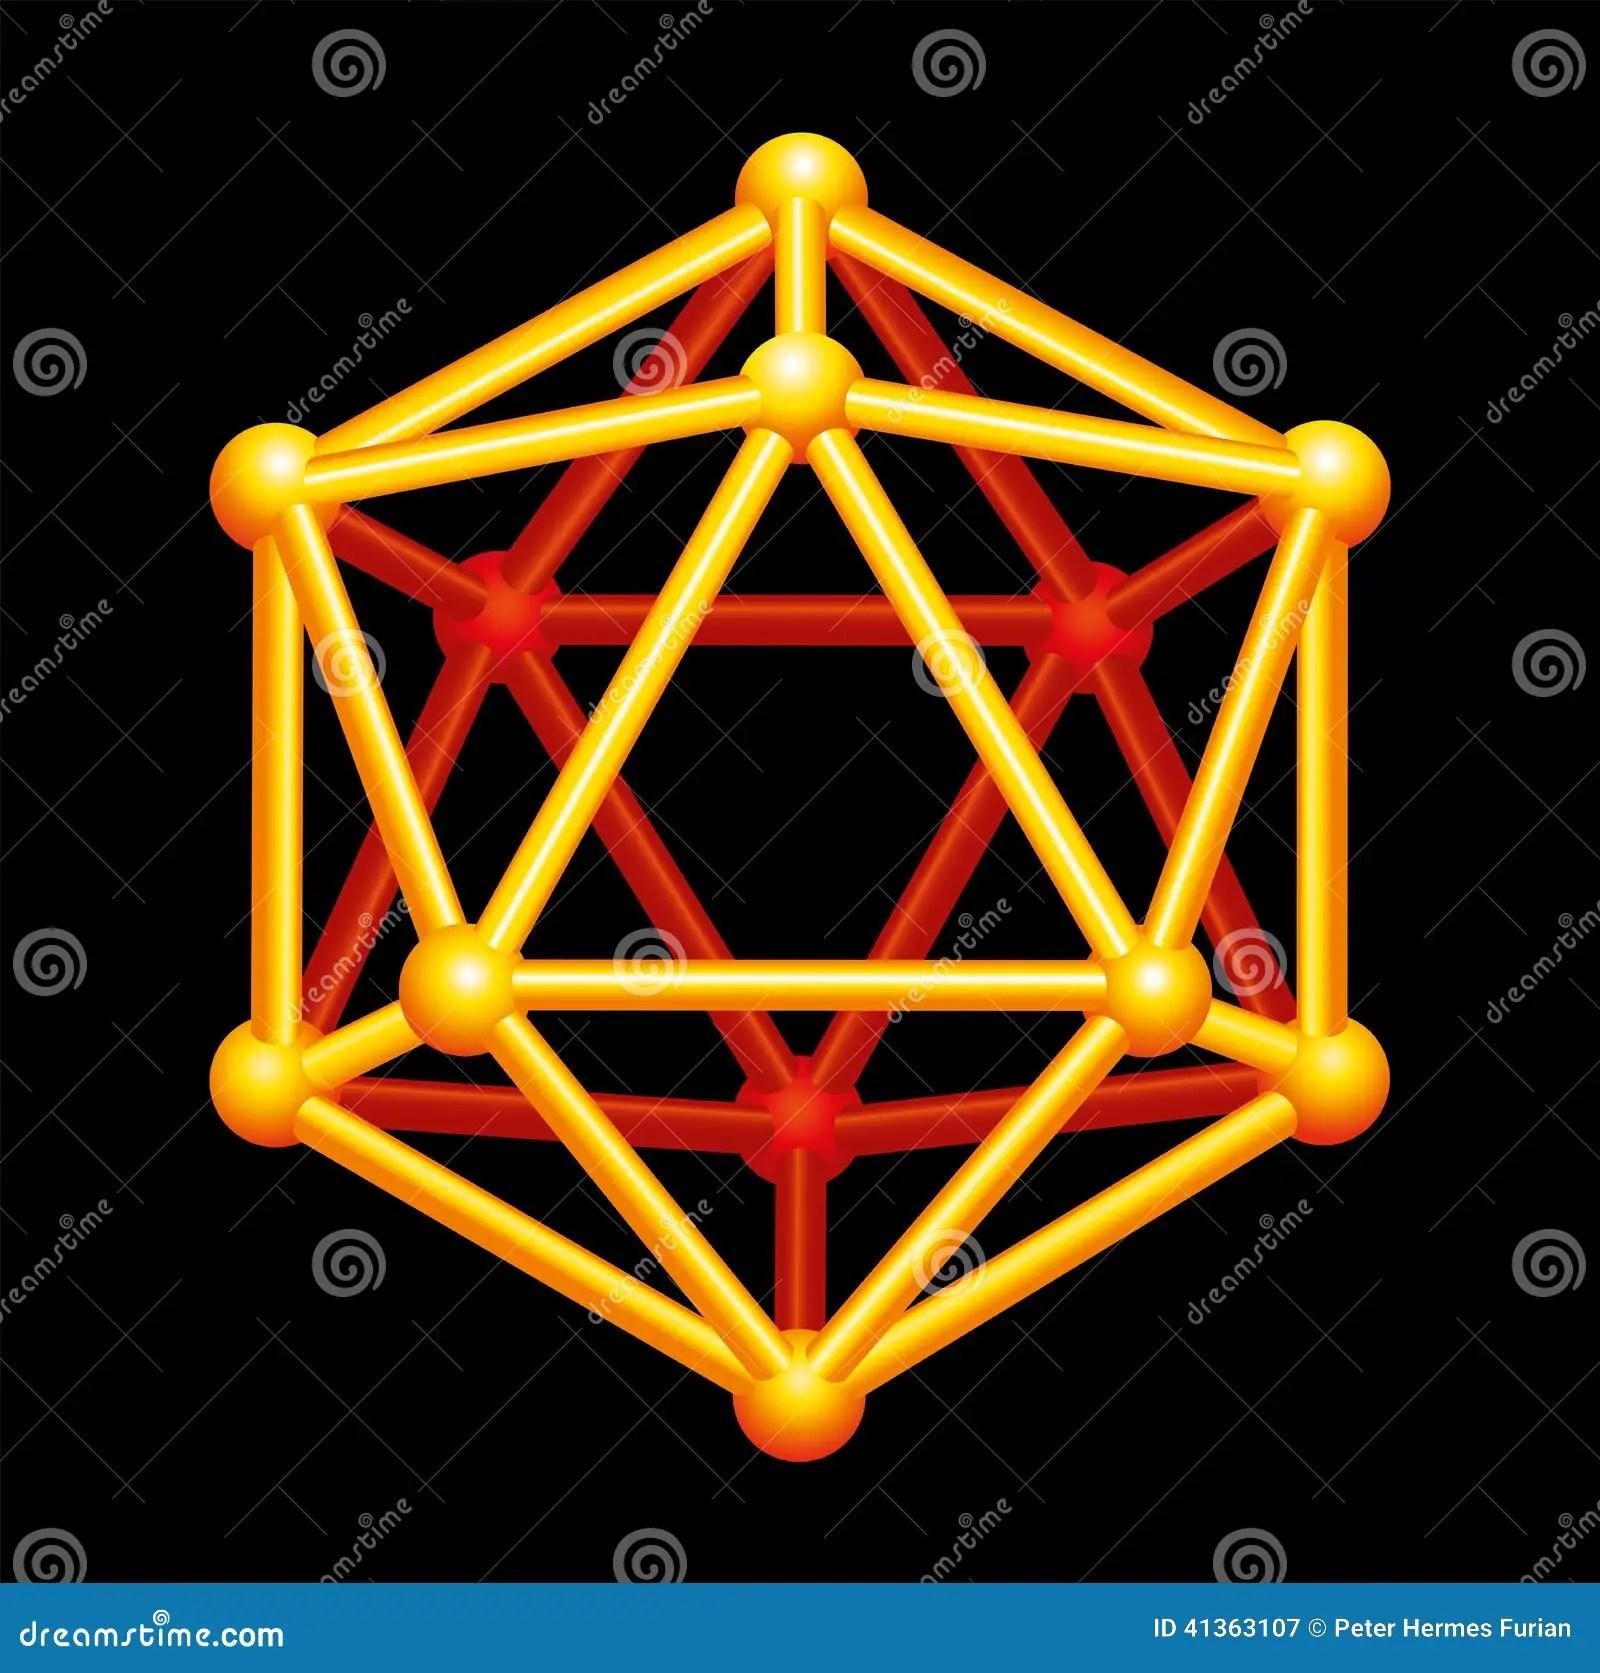 Icosahedron Gold Three Dimensional Shape Stock Vector